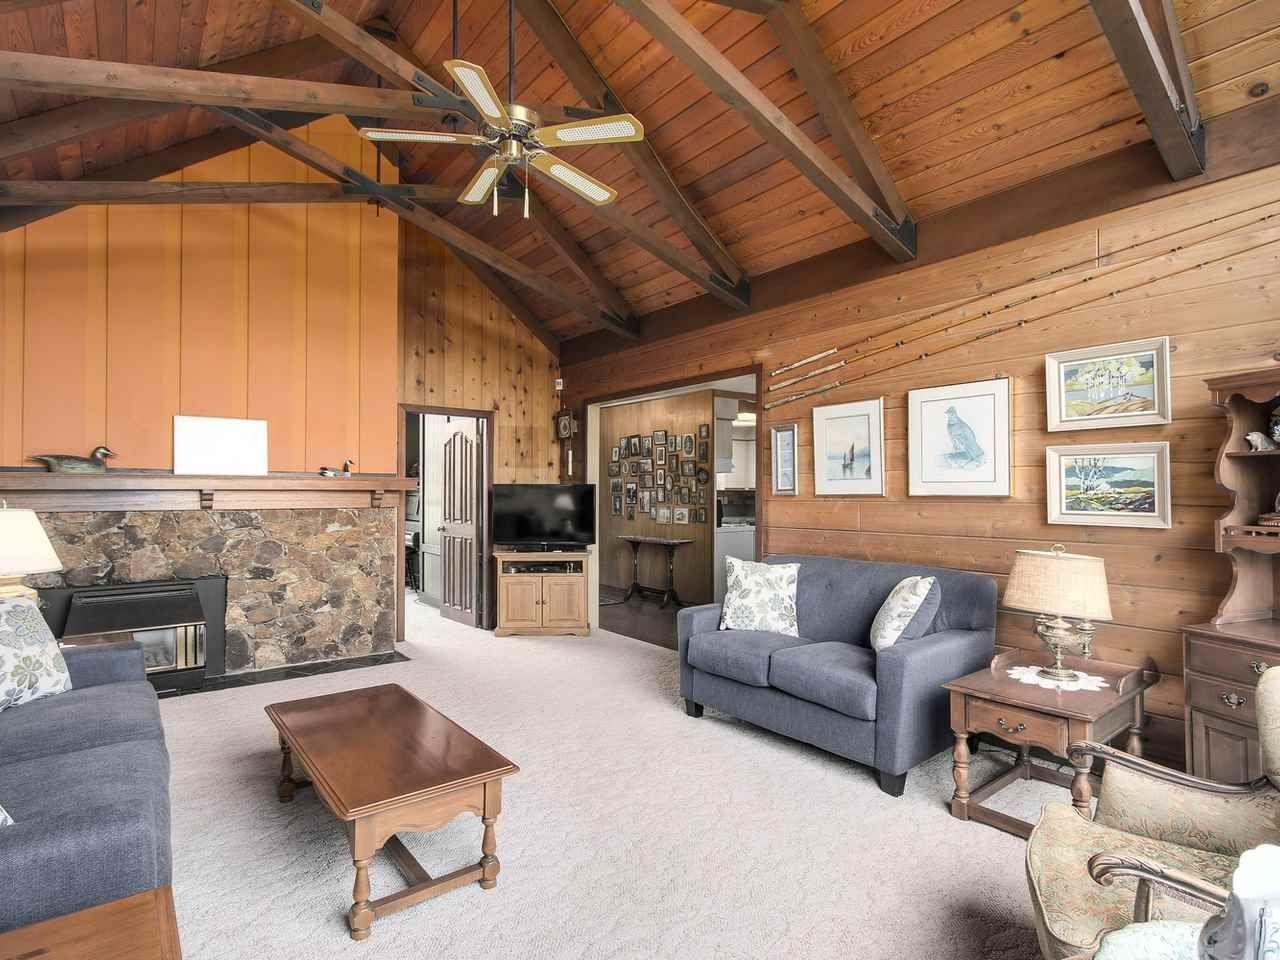 Photo 4: Photos: 1320 REGAN Avenue in Coquitlam: Central Coquitlam House for sale : MLS®# R2147096